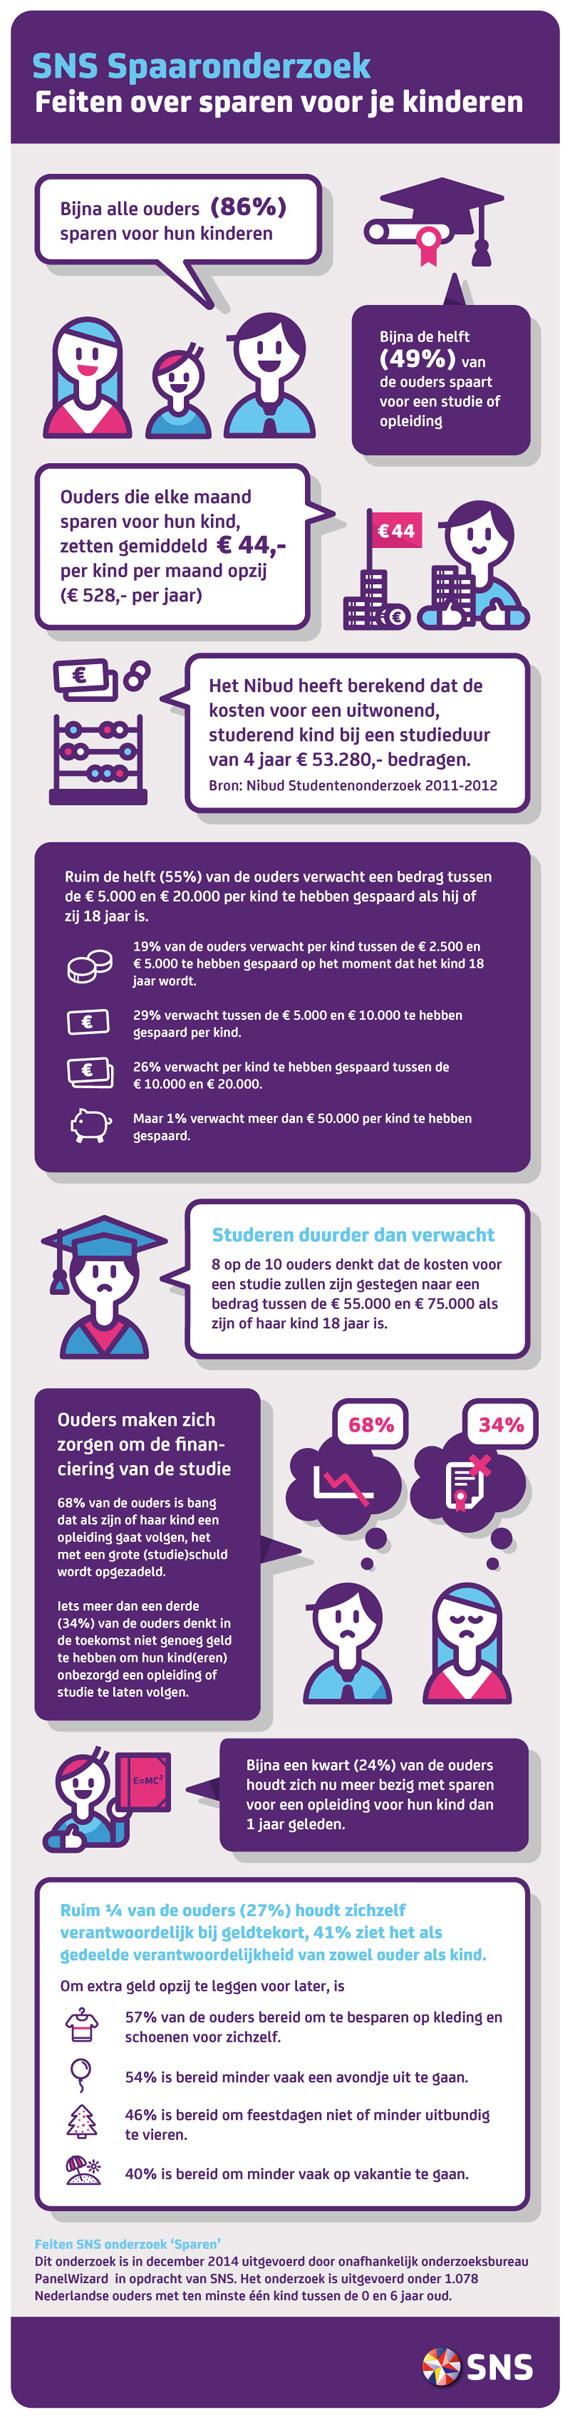 infographic_sns_kindsparen